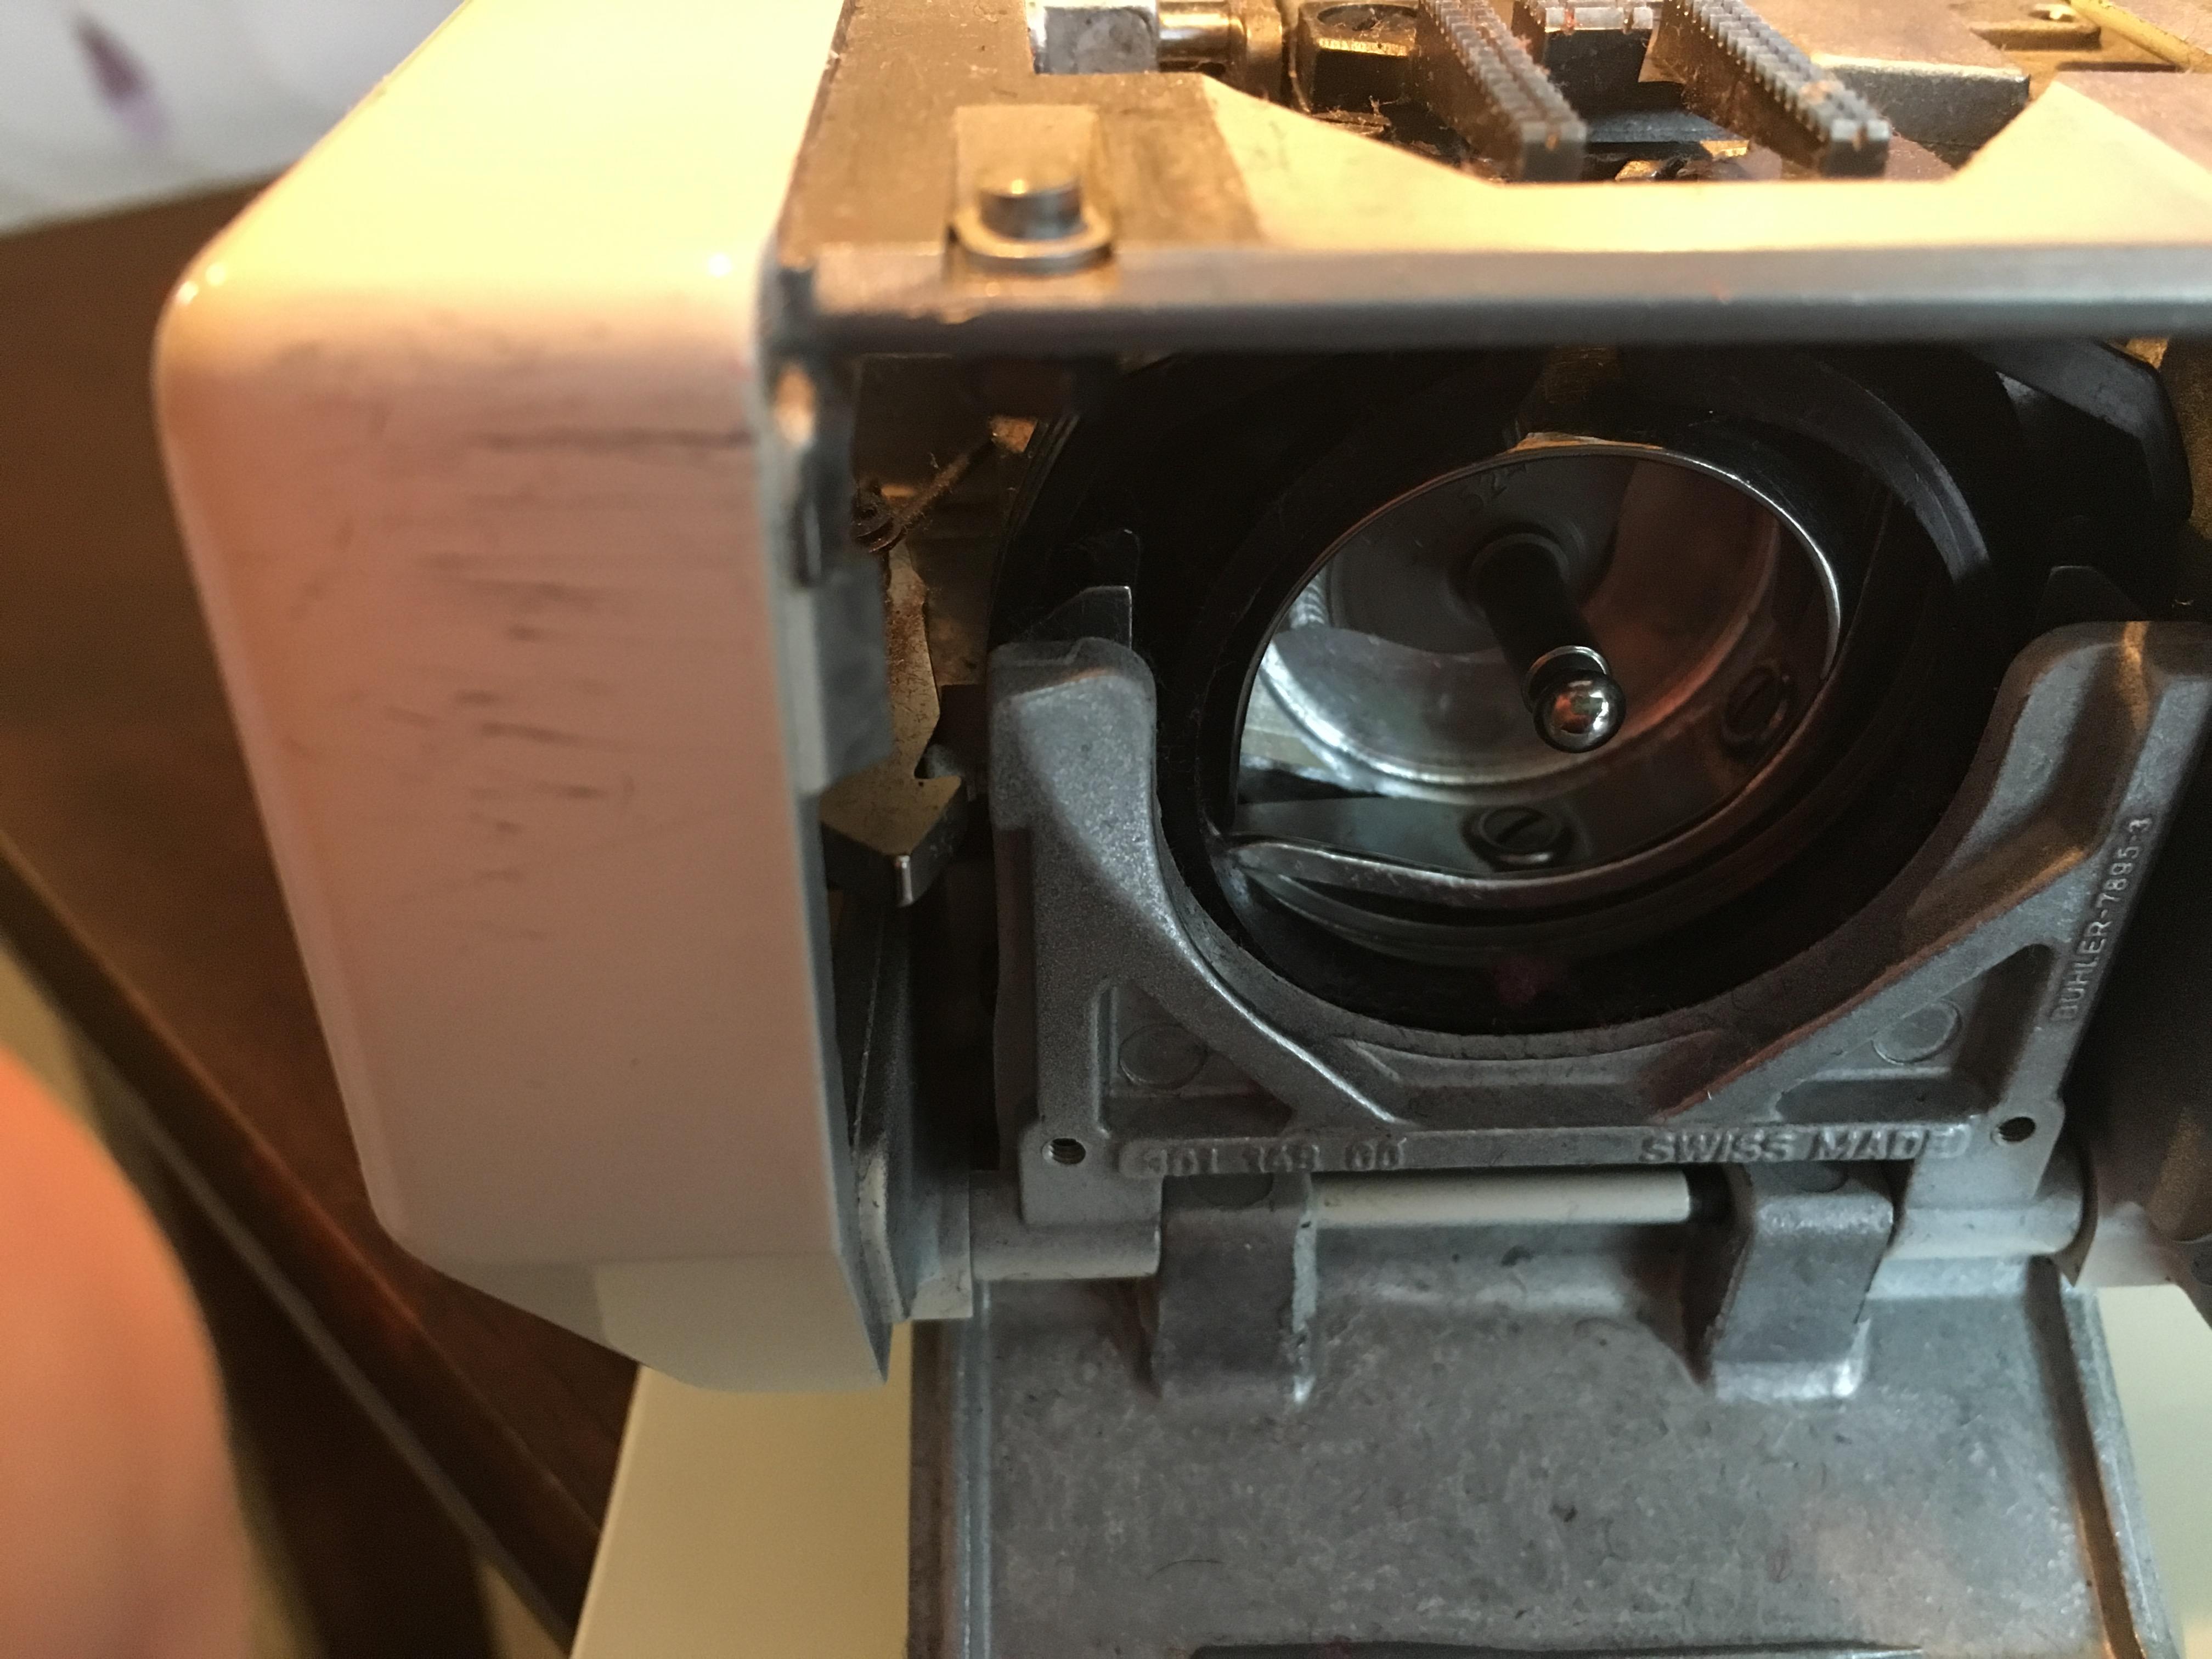 Picture of Clean Bobbin Compartment